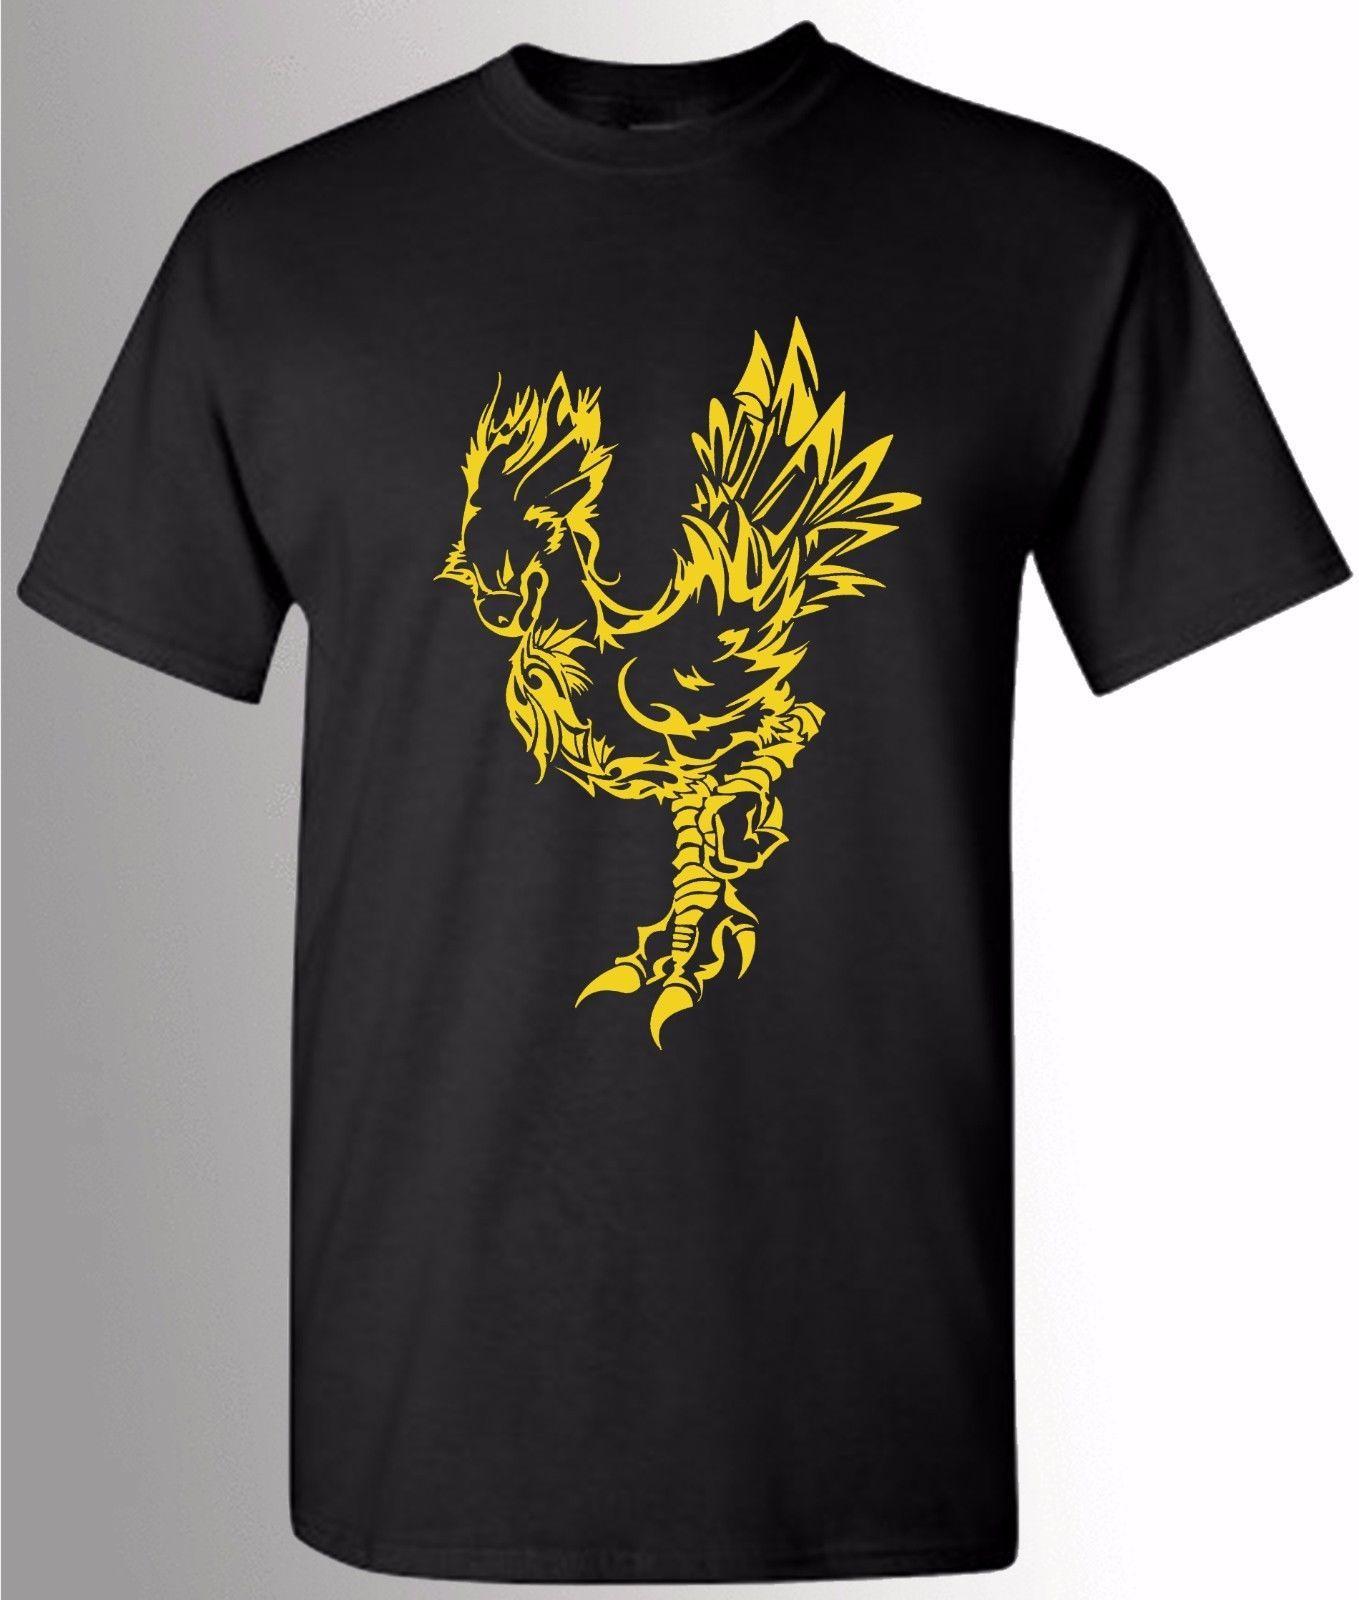 Final Fantasy, Chocobo T-Shirt, FF7 FF8 FF9 FF10 FF15, PS4 Gamers tee,  Unisex